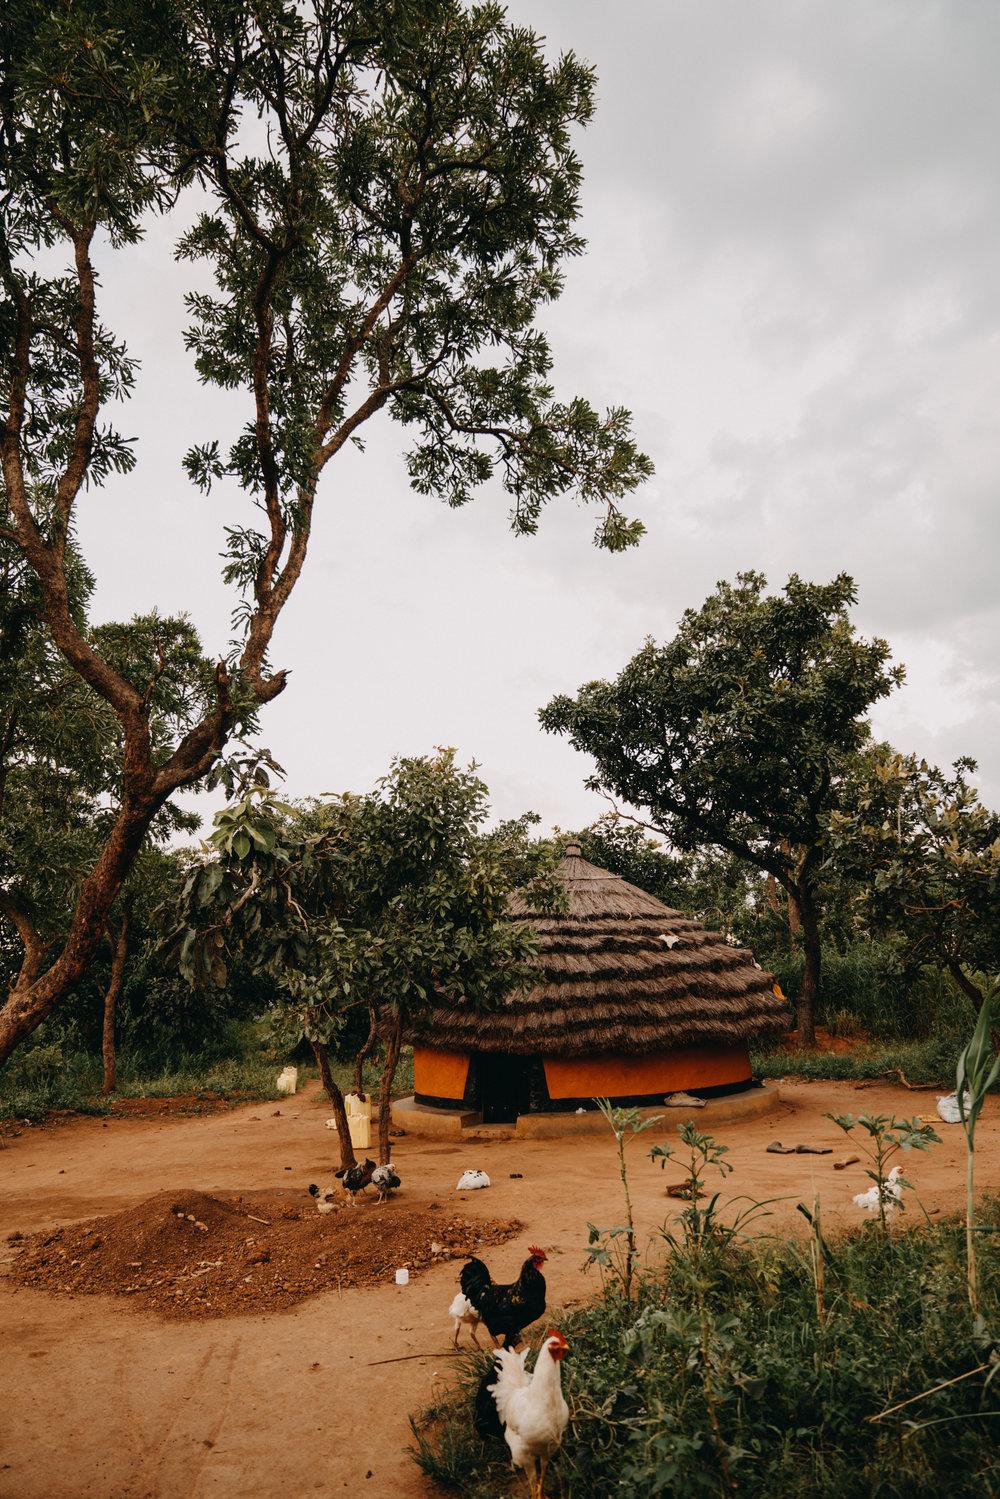 uganda july 2018-4.jpg